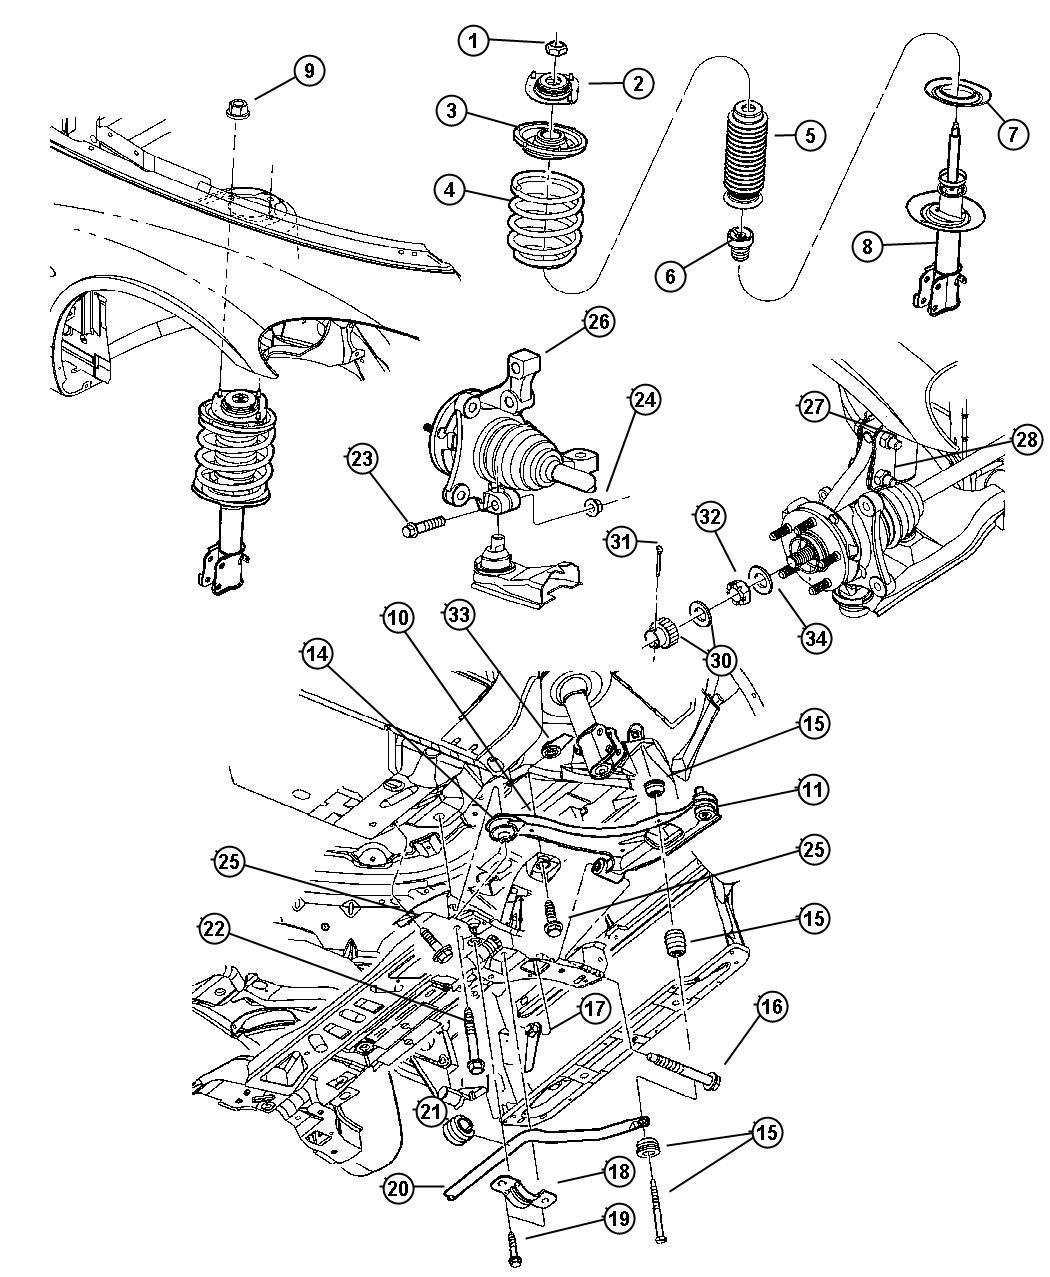 1998 buick skylark engine diagram